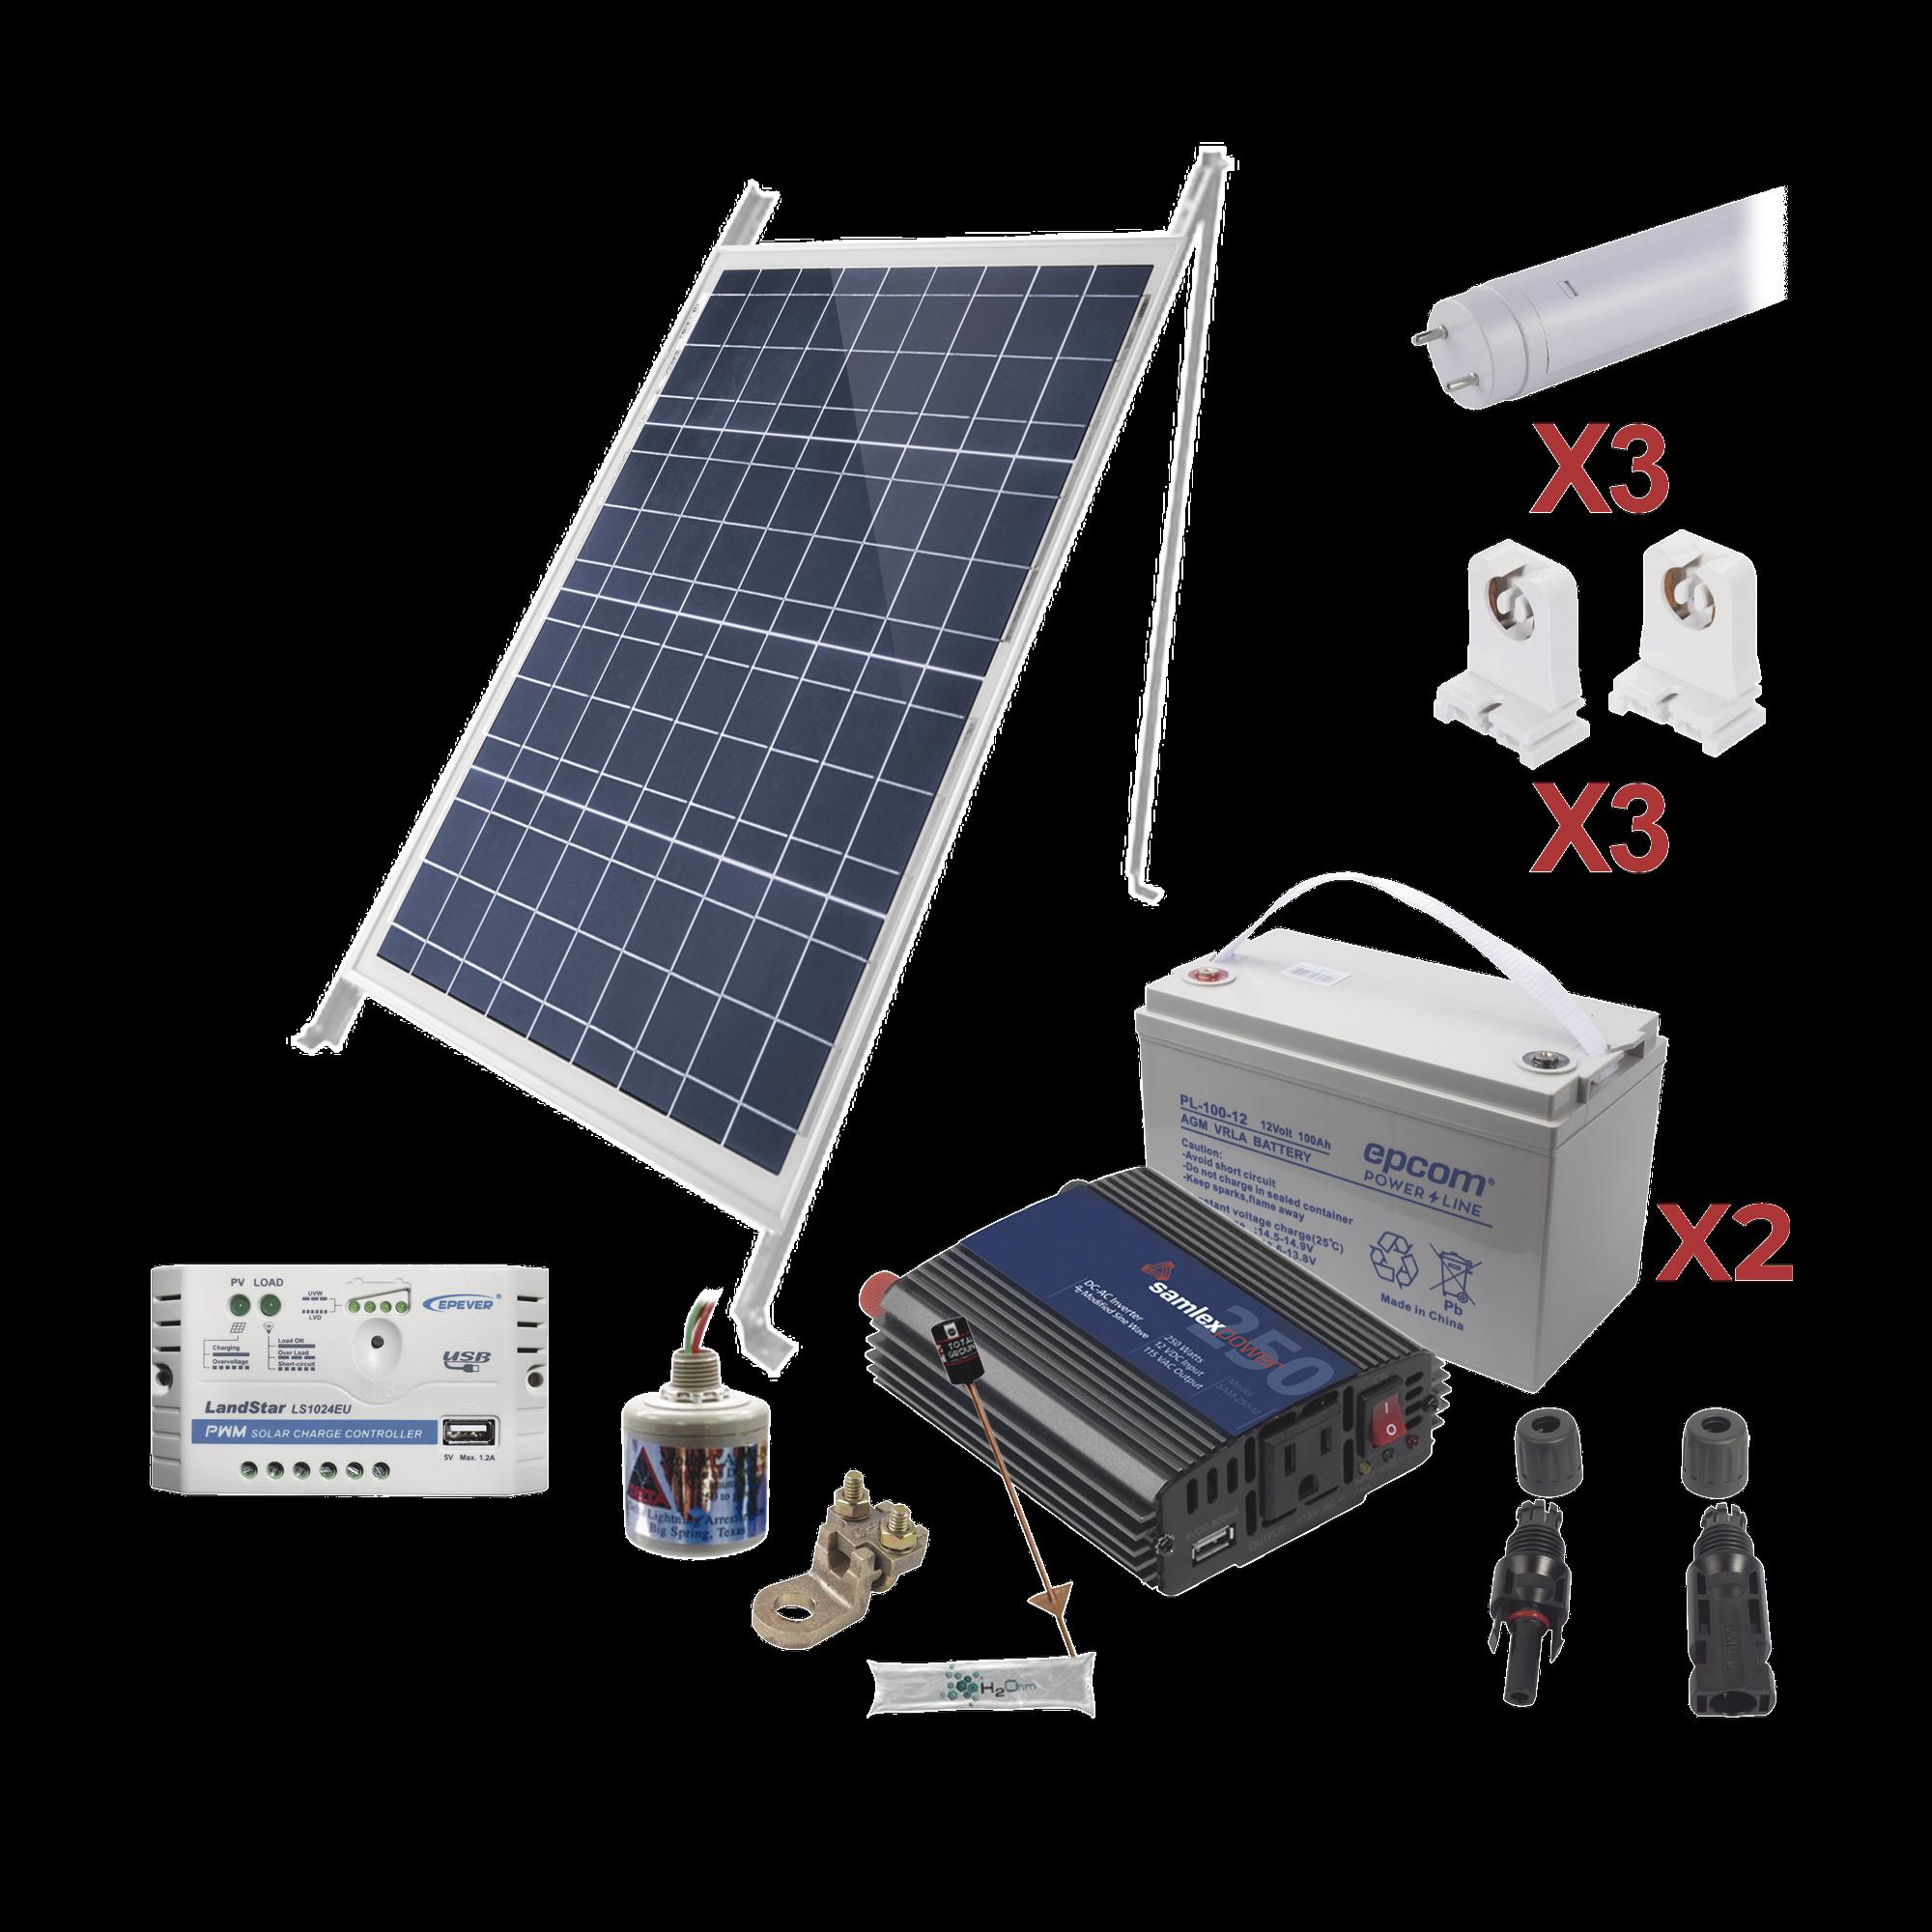 Kit Solar Para Iluminacion Básica en Zonas Rurales, 3 Tubos Led